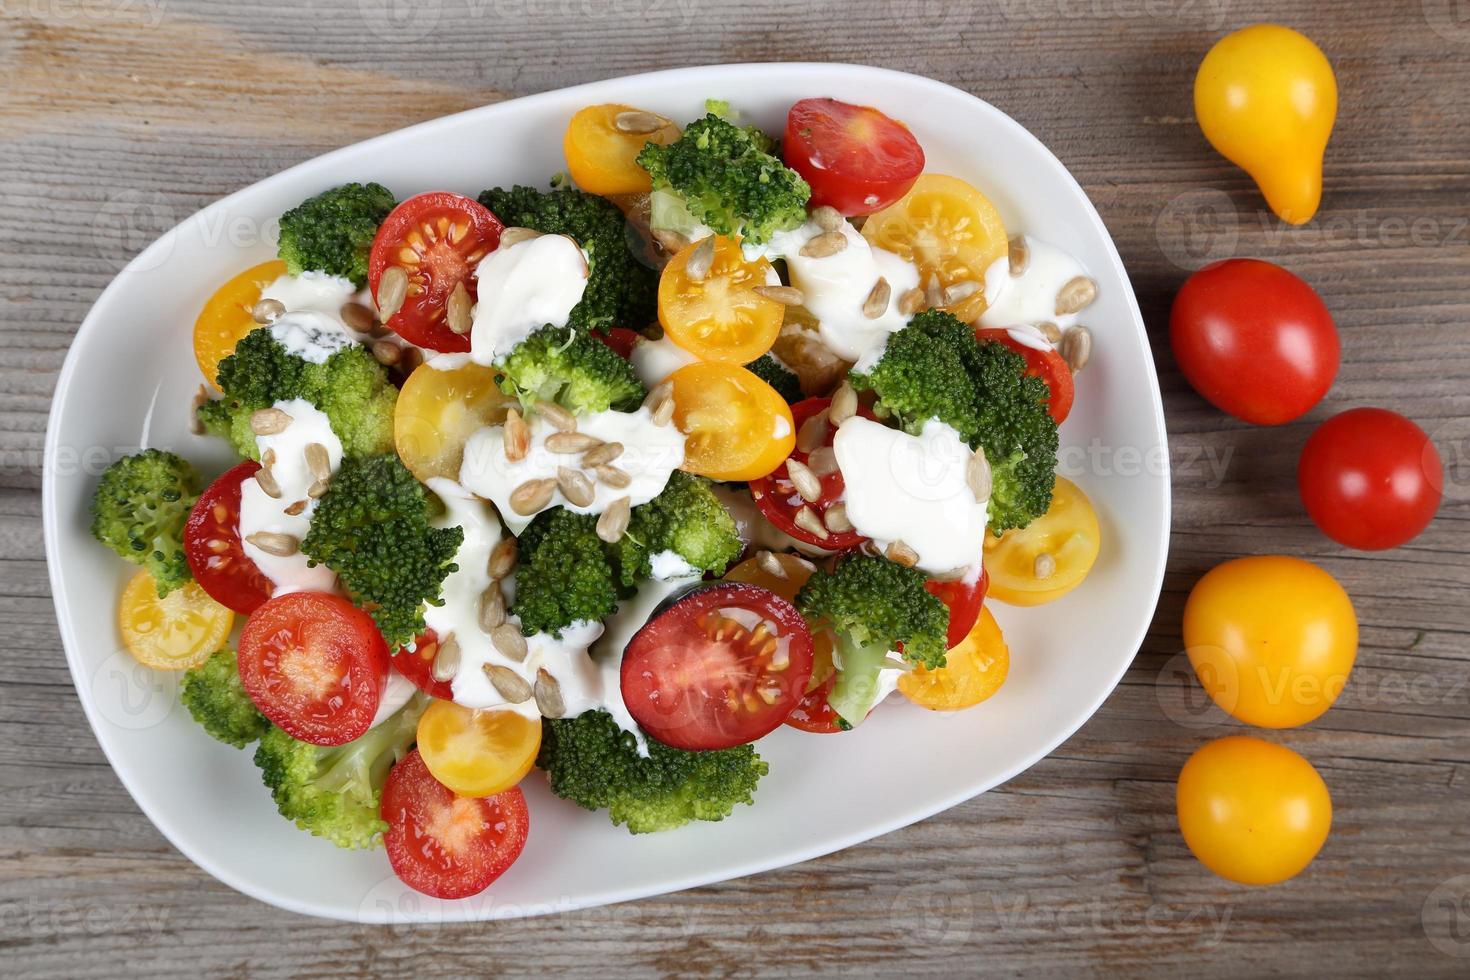 bunter Salat. foto